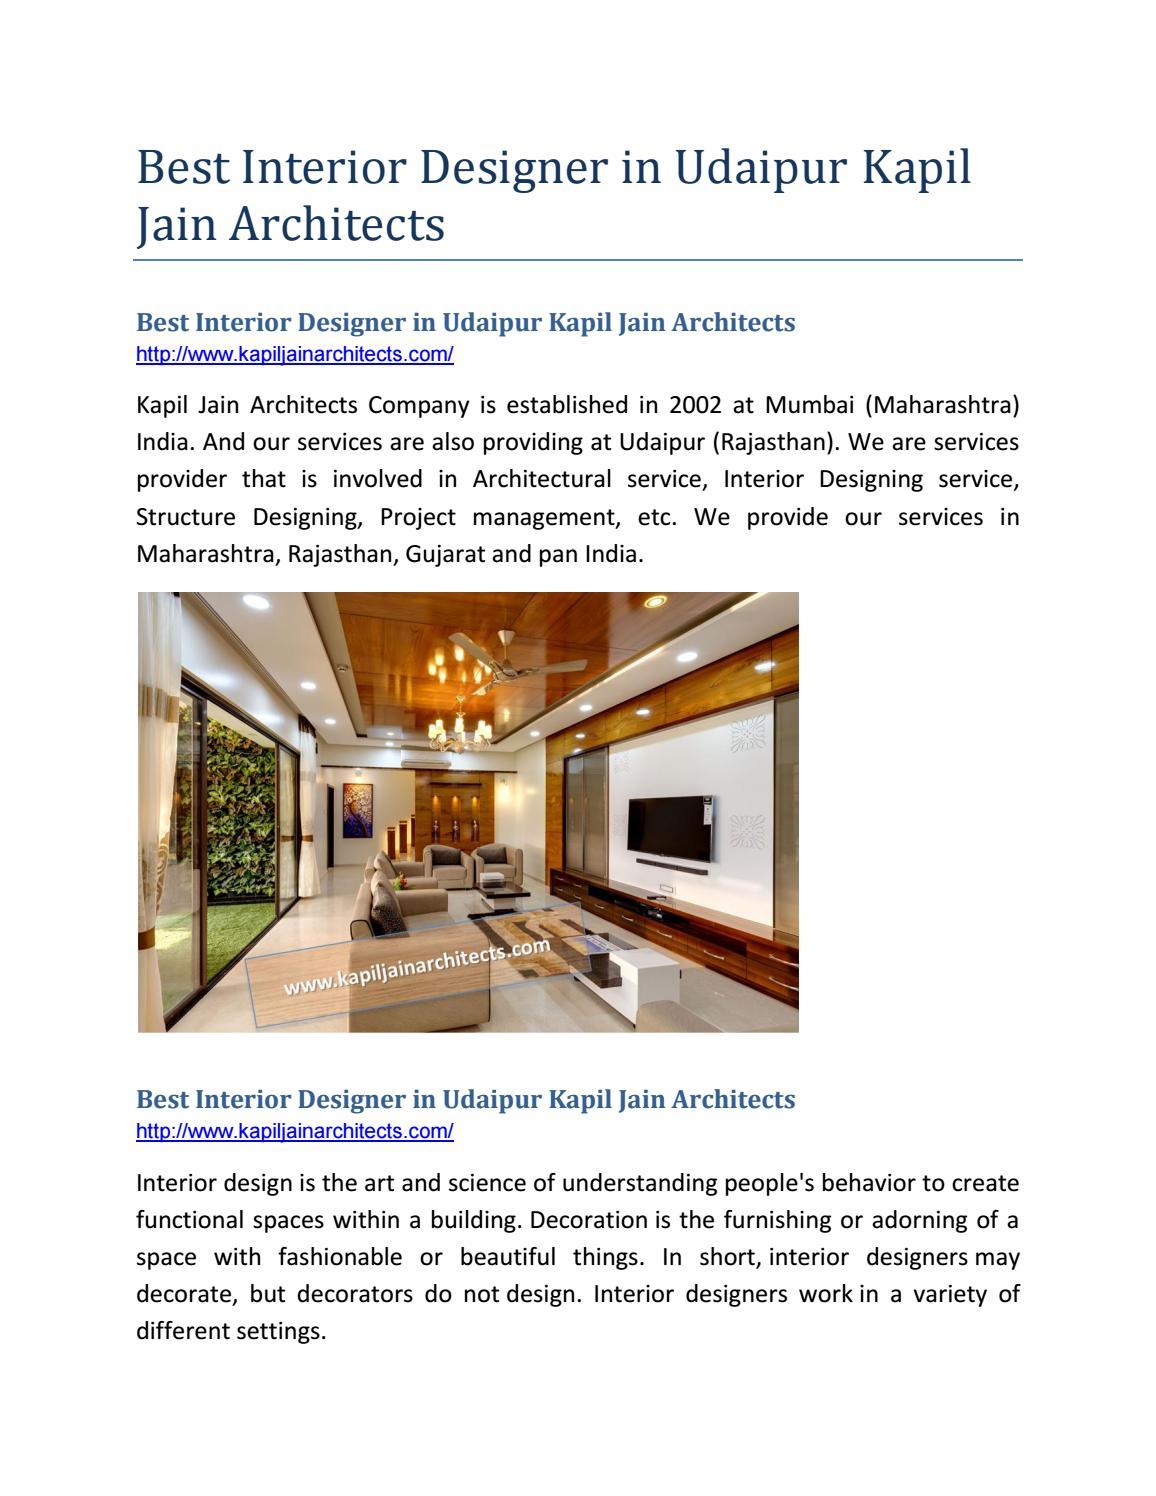 Best Architect In Udaipur Kapil Jain Architecture By Architect Udaipur Issuu